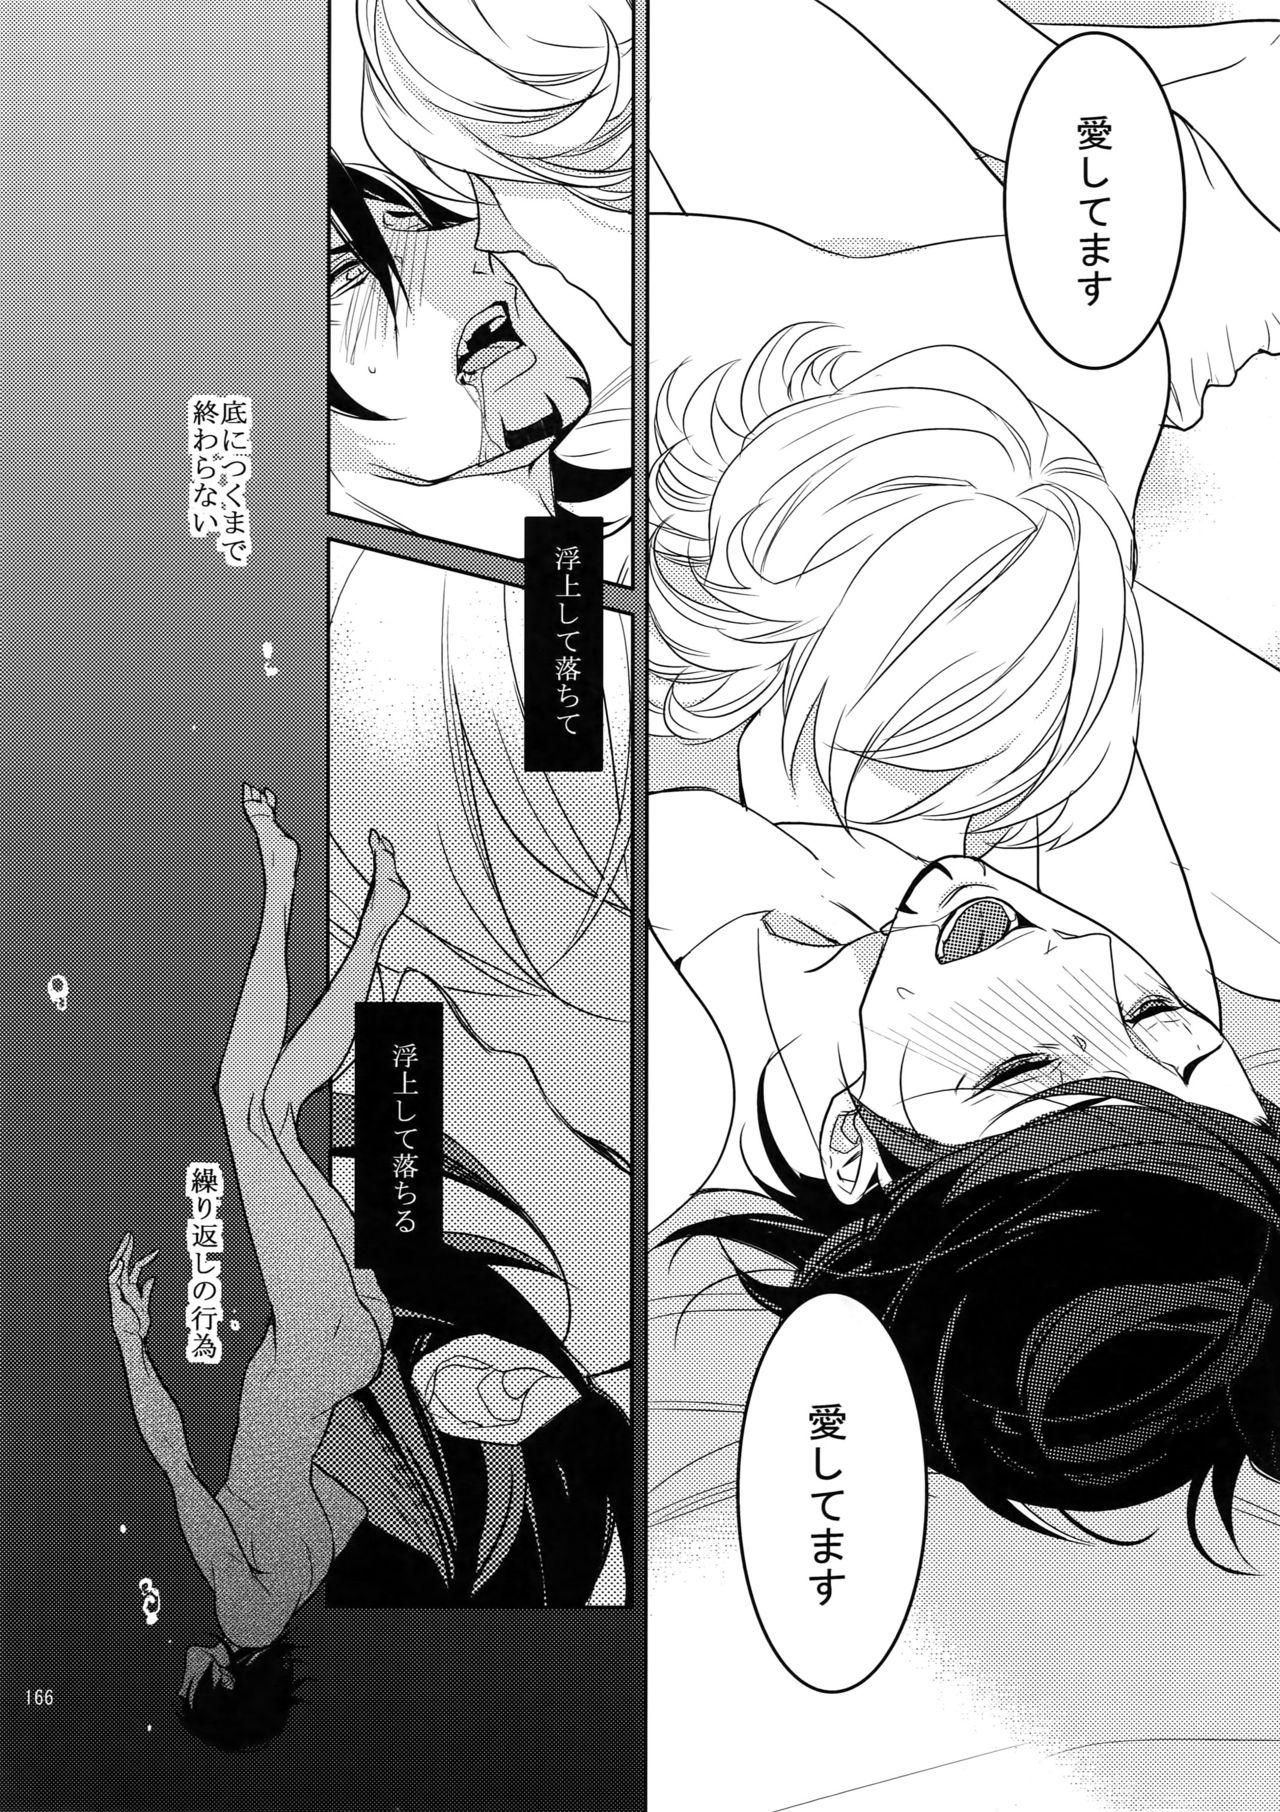 BOROZS Usagi Tora Sairoku 164